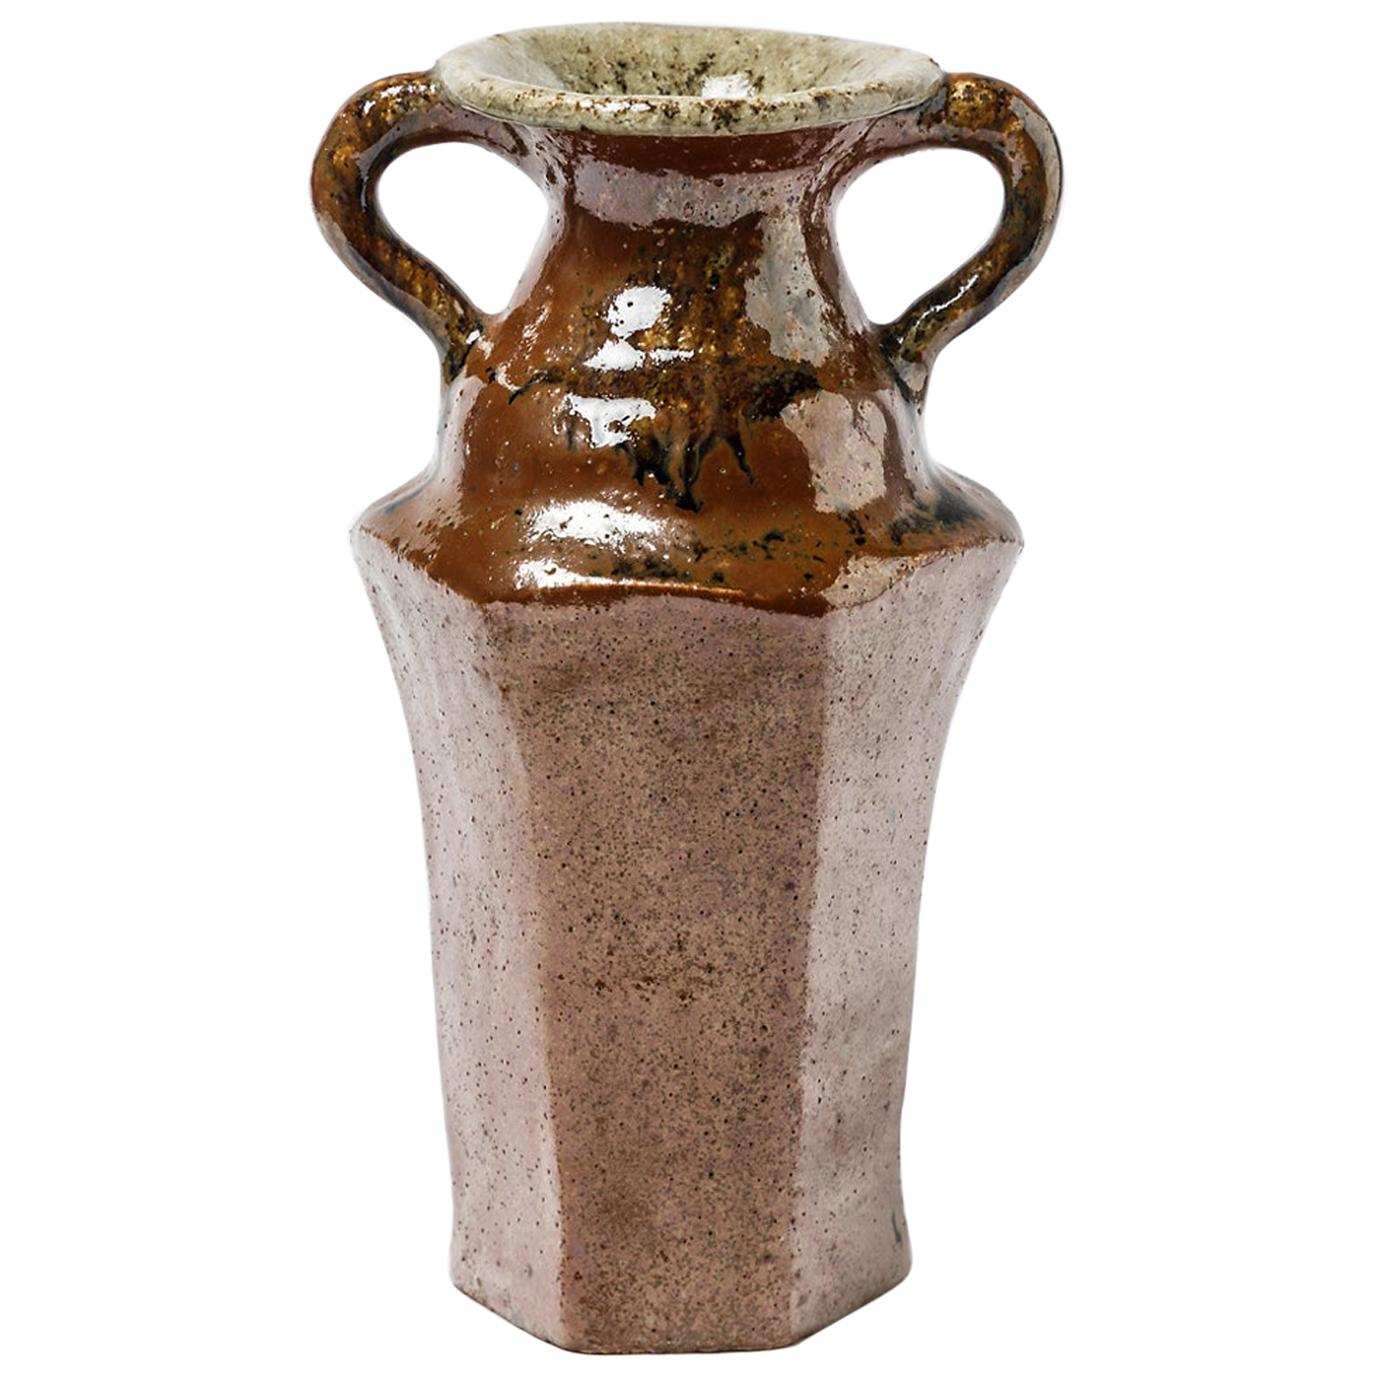 XXth Century Red Brown Ceramic Vase by Yoland Cazenove French Design